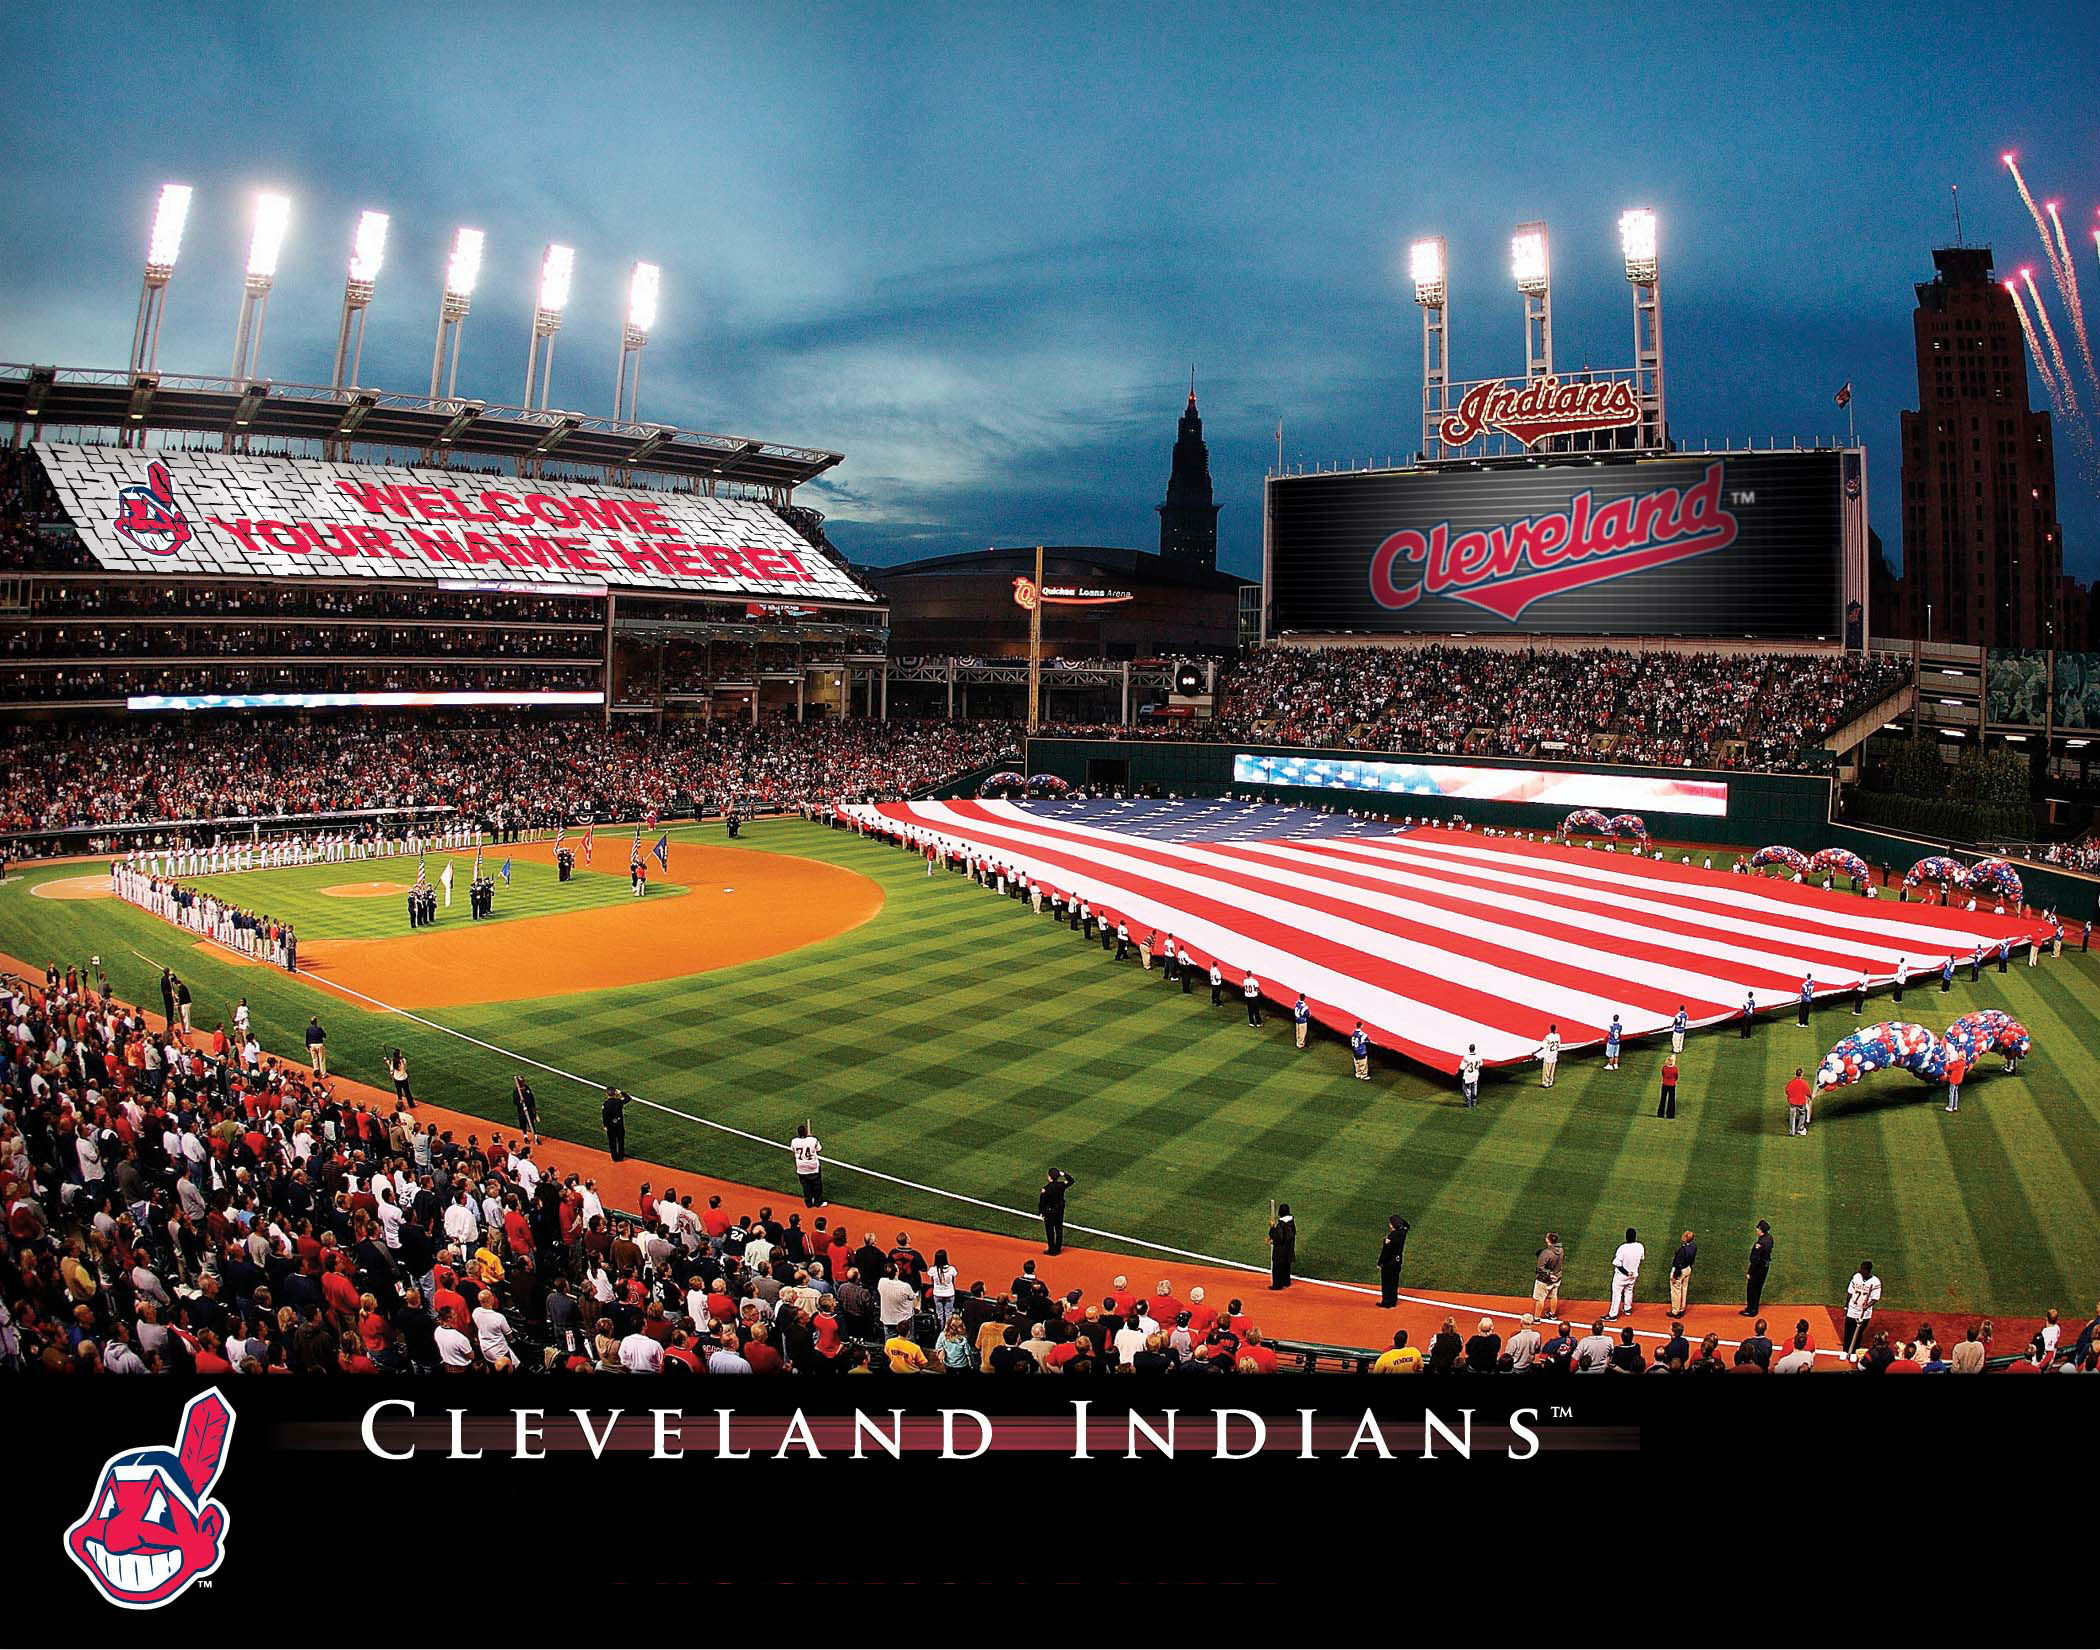 CLEVELAND INDIANS mlb baseball (24) wallpaper | .